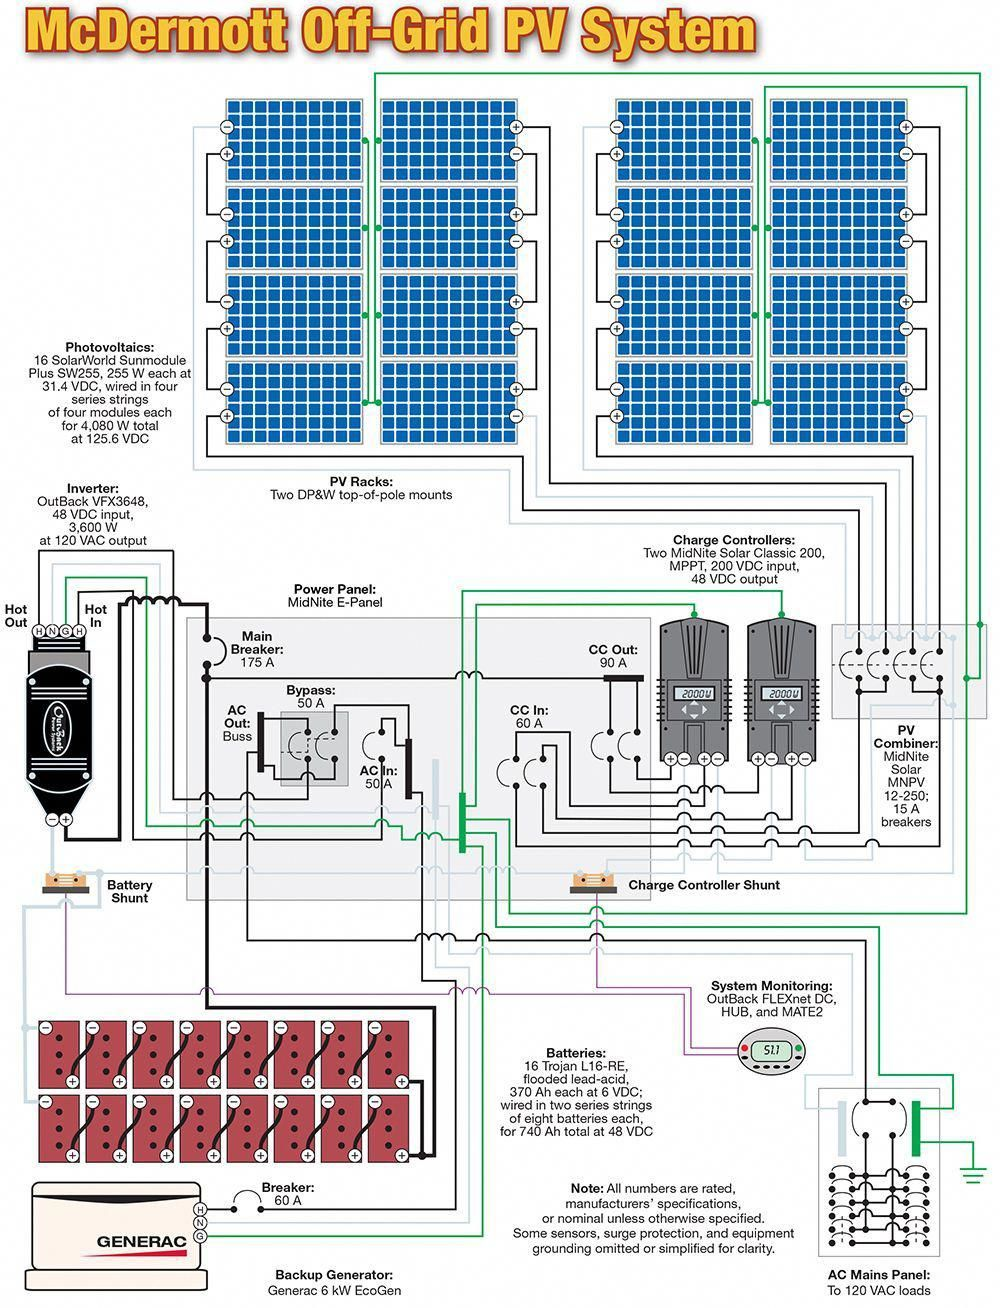 wiring off grid pv system 4kwh solarenergy solarpanels solarpower solarpanelsforhome solarpanelkits solarpoweredgenerator  [ 1000 x 1308 Pixel ]